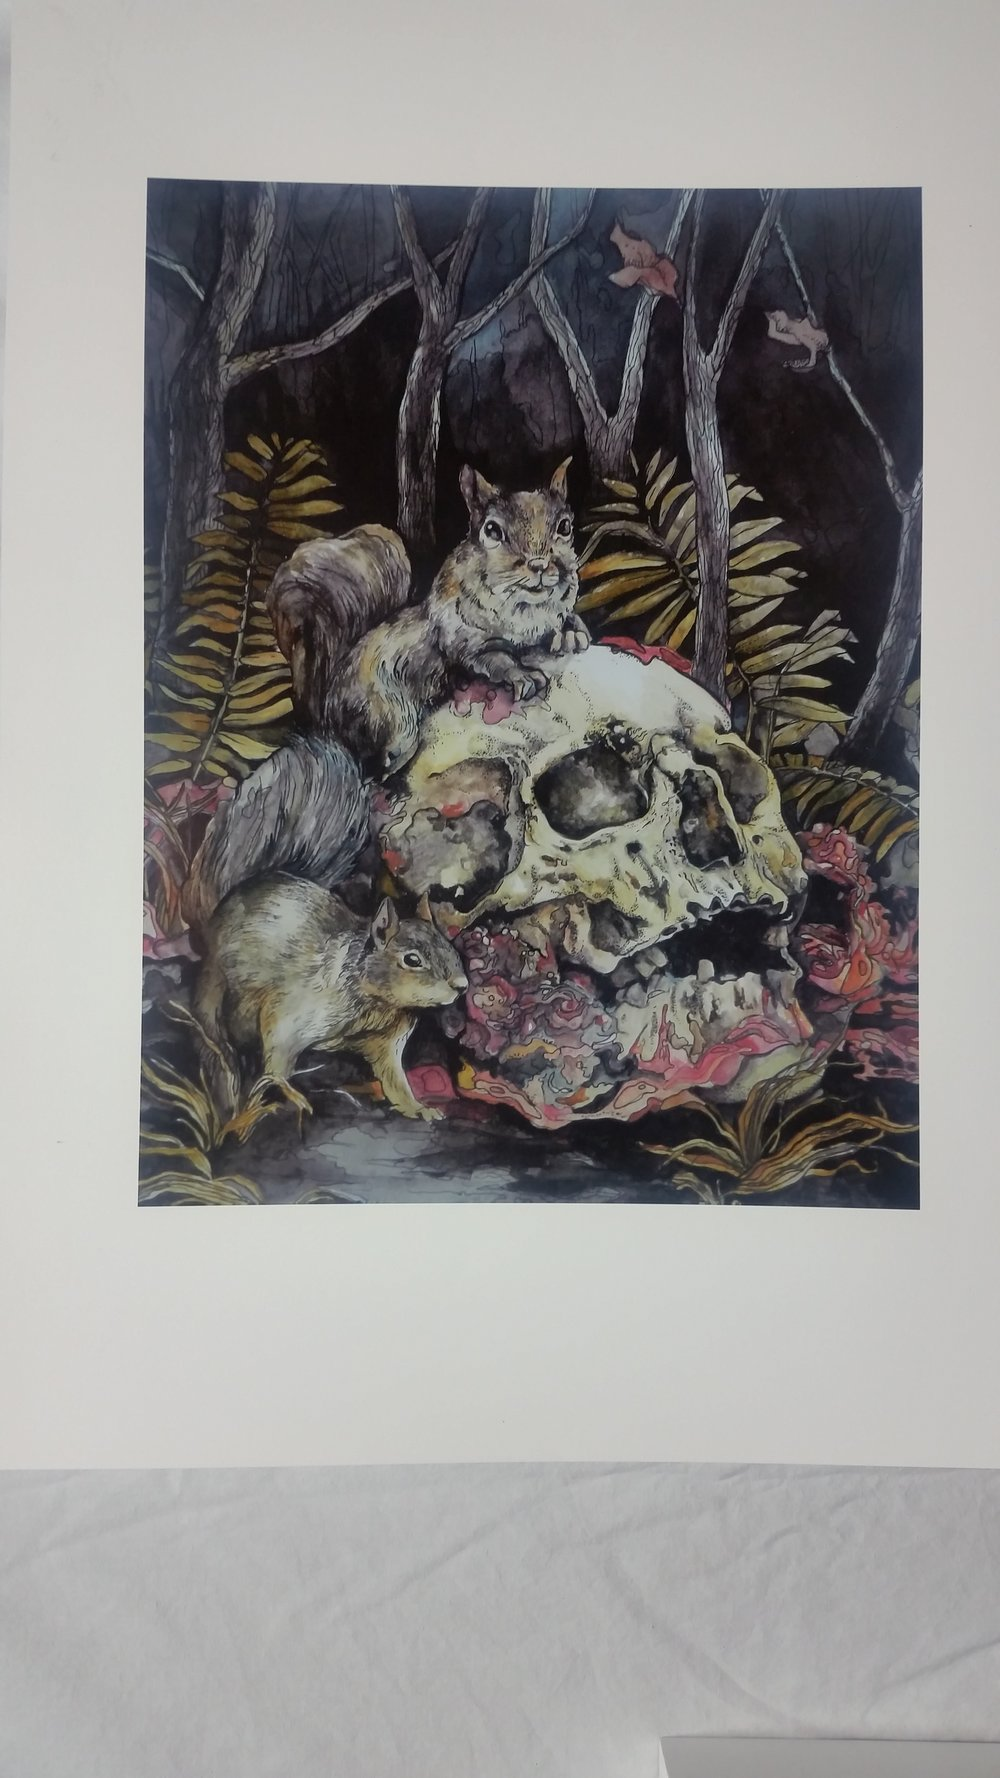 Creepy art by Patricia Taylor